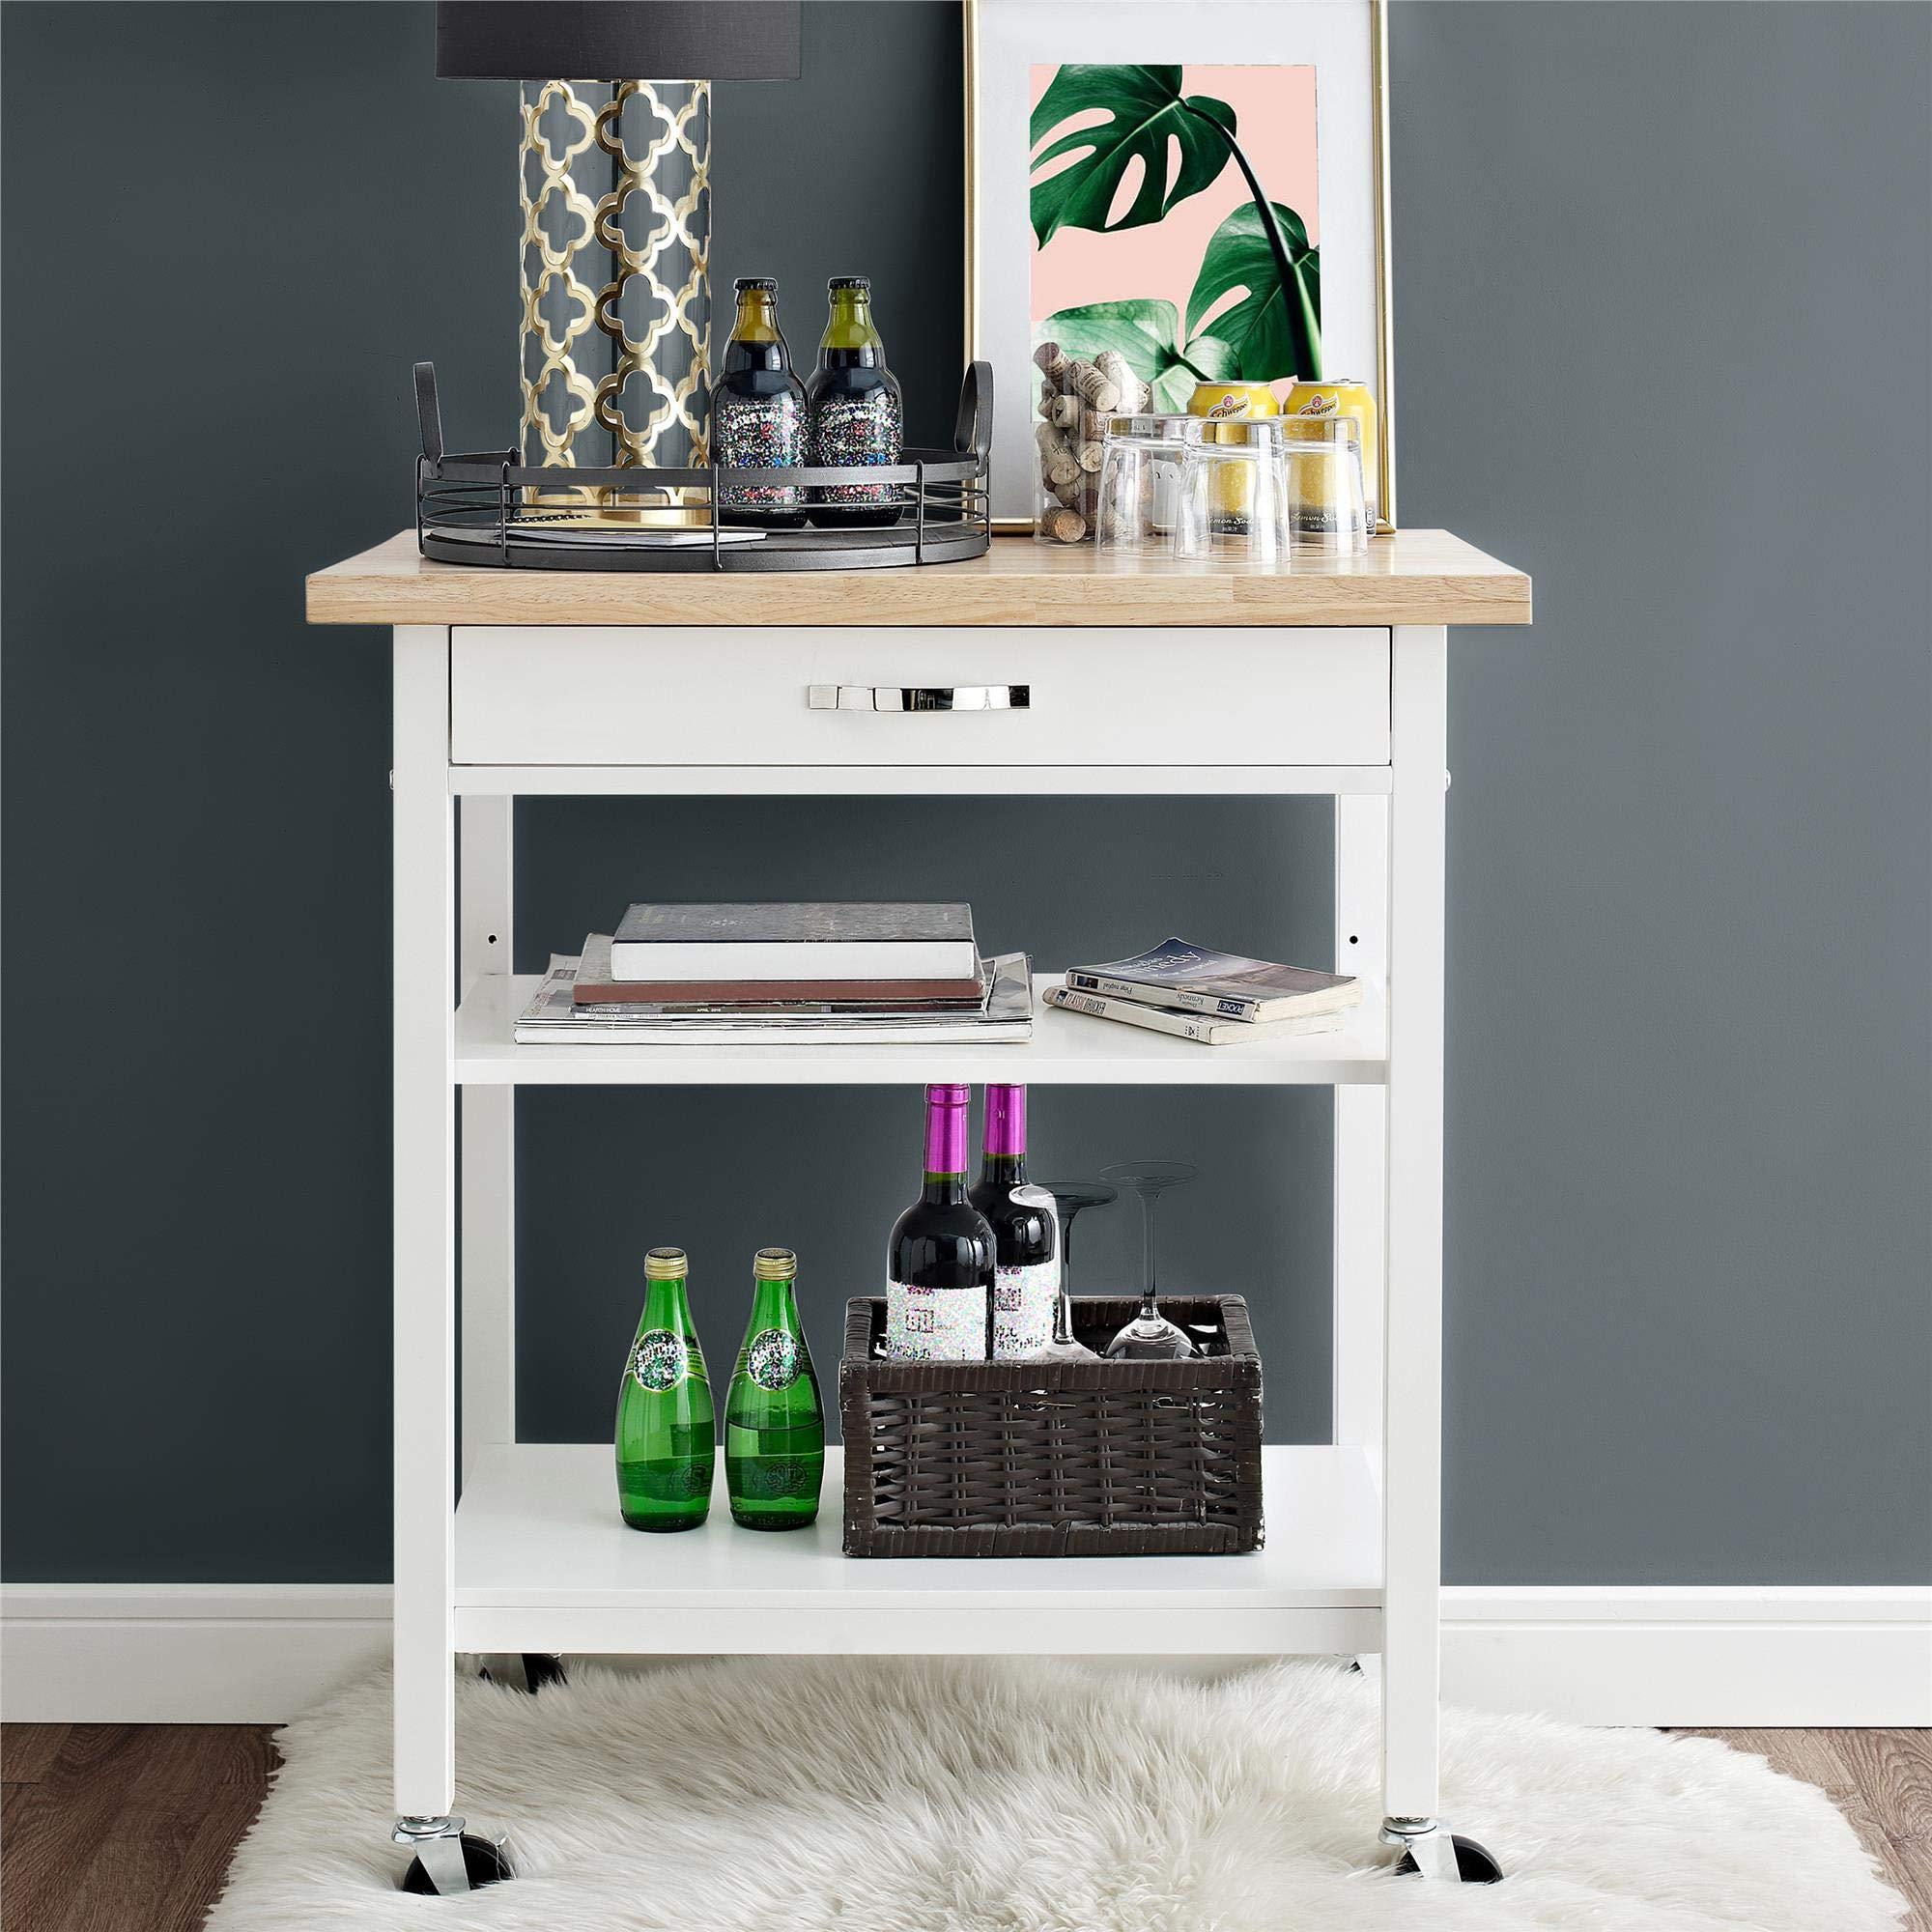 Dorel Living DL7618-DC Hogan Multifunction, White Kitchen Carts,